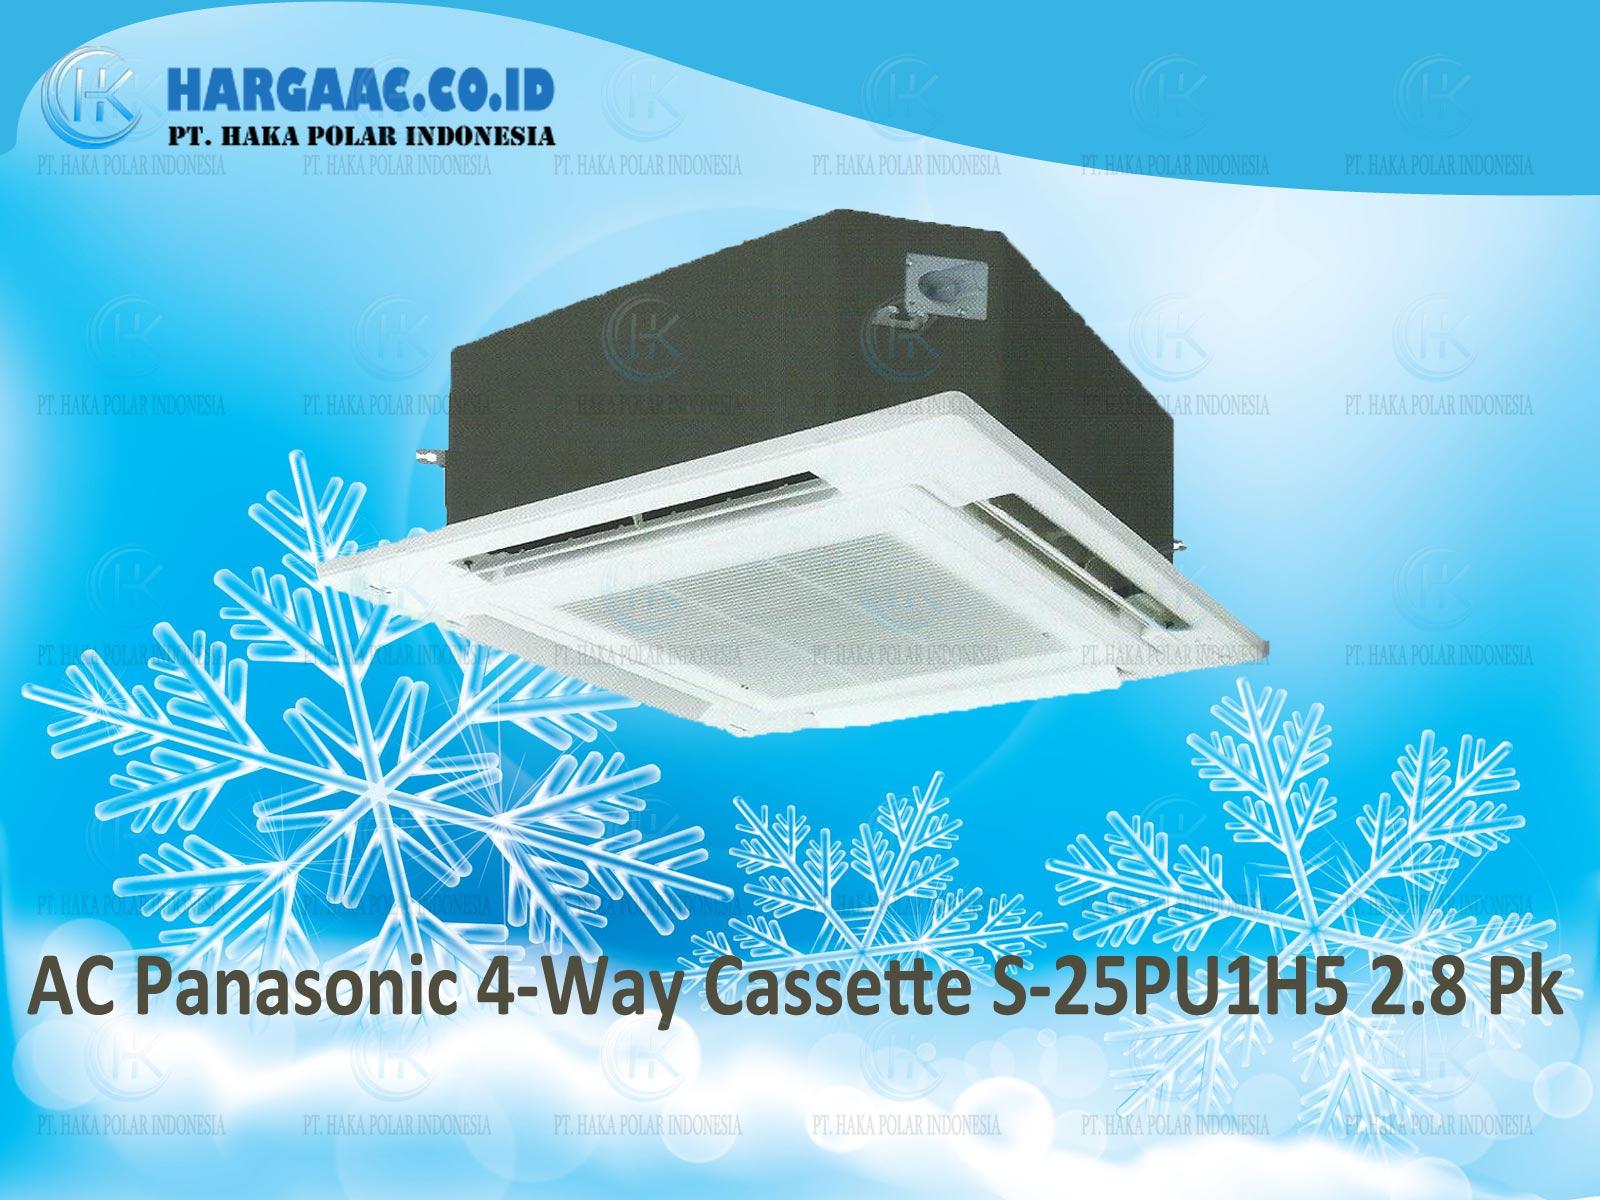 AC Panasonic 4-Way Cassette S-25PU1H5 1 Phase 2.8 PK R410a